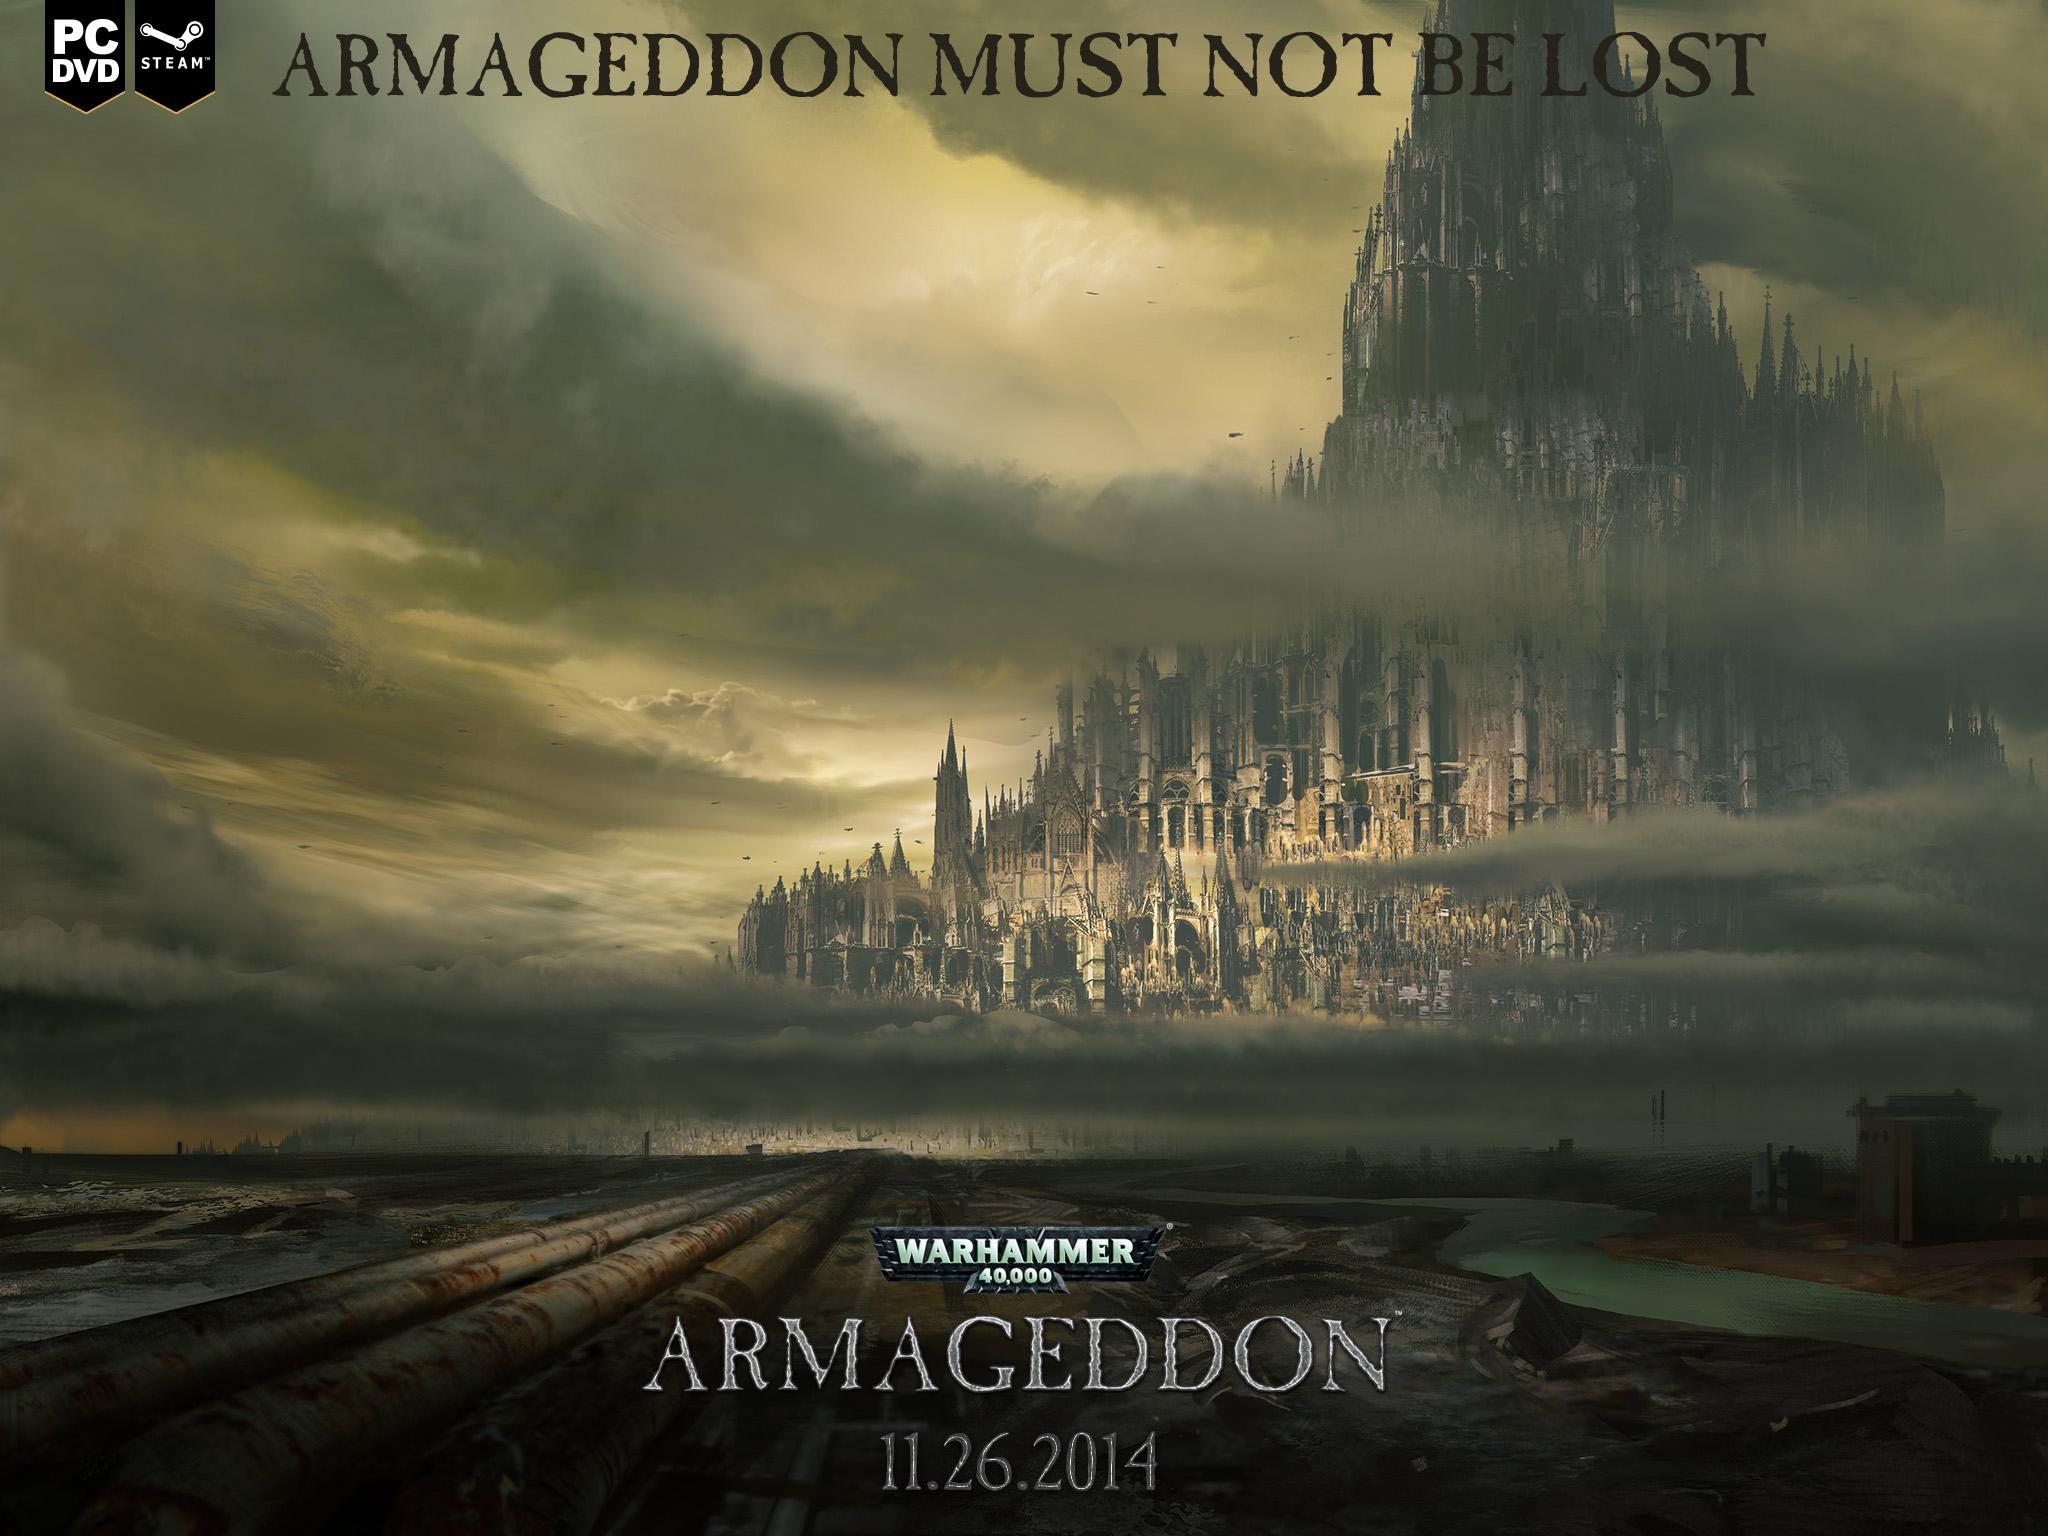 Warhammer 40000 armageddon teaser 1711